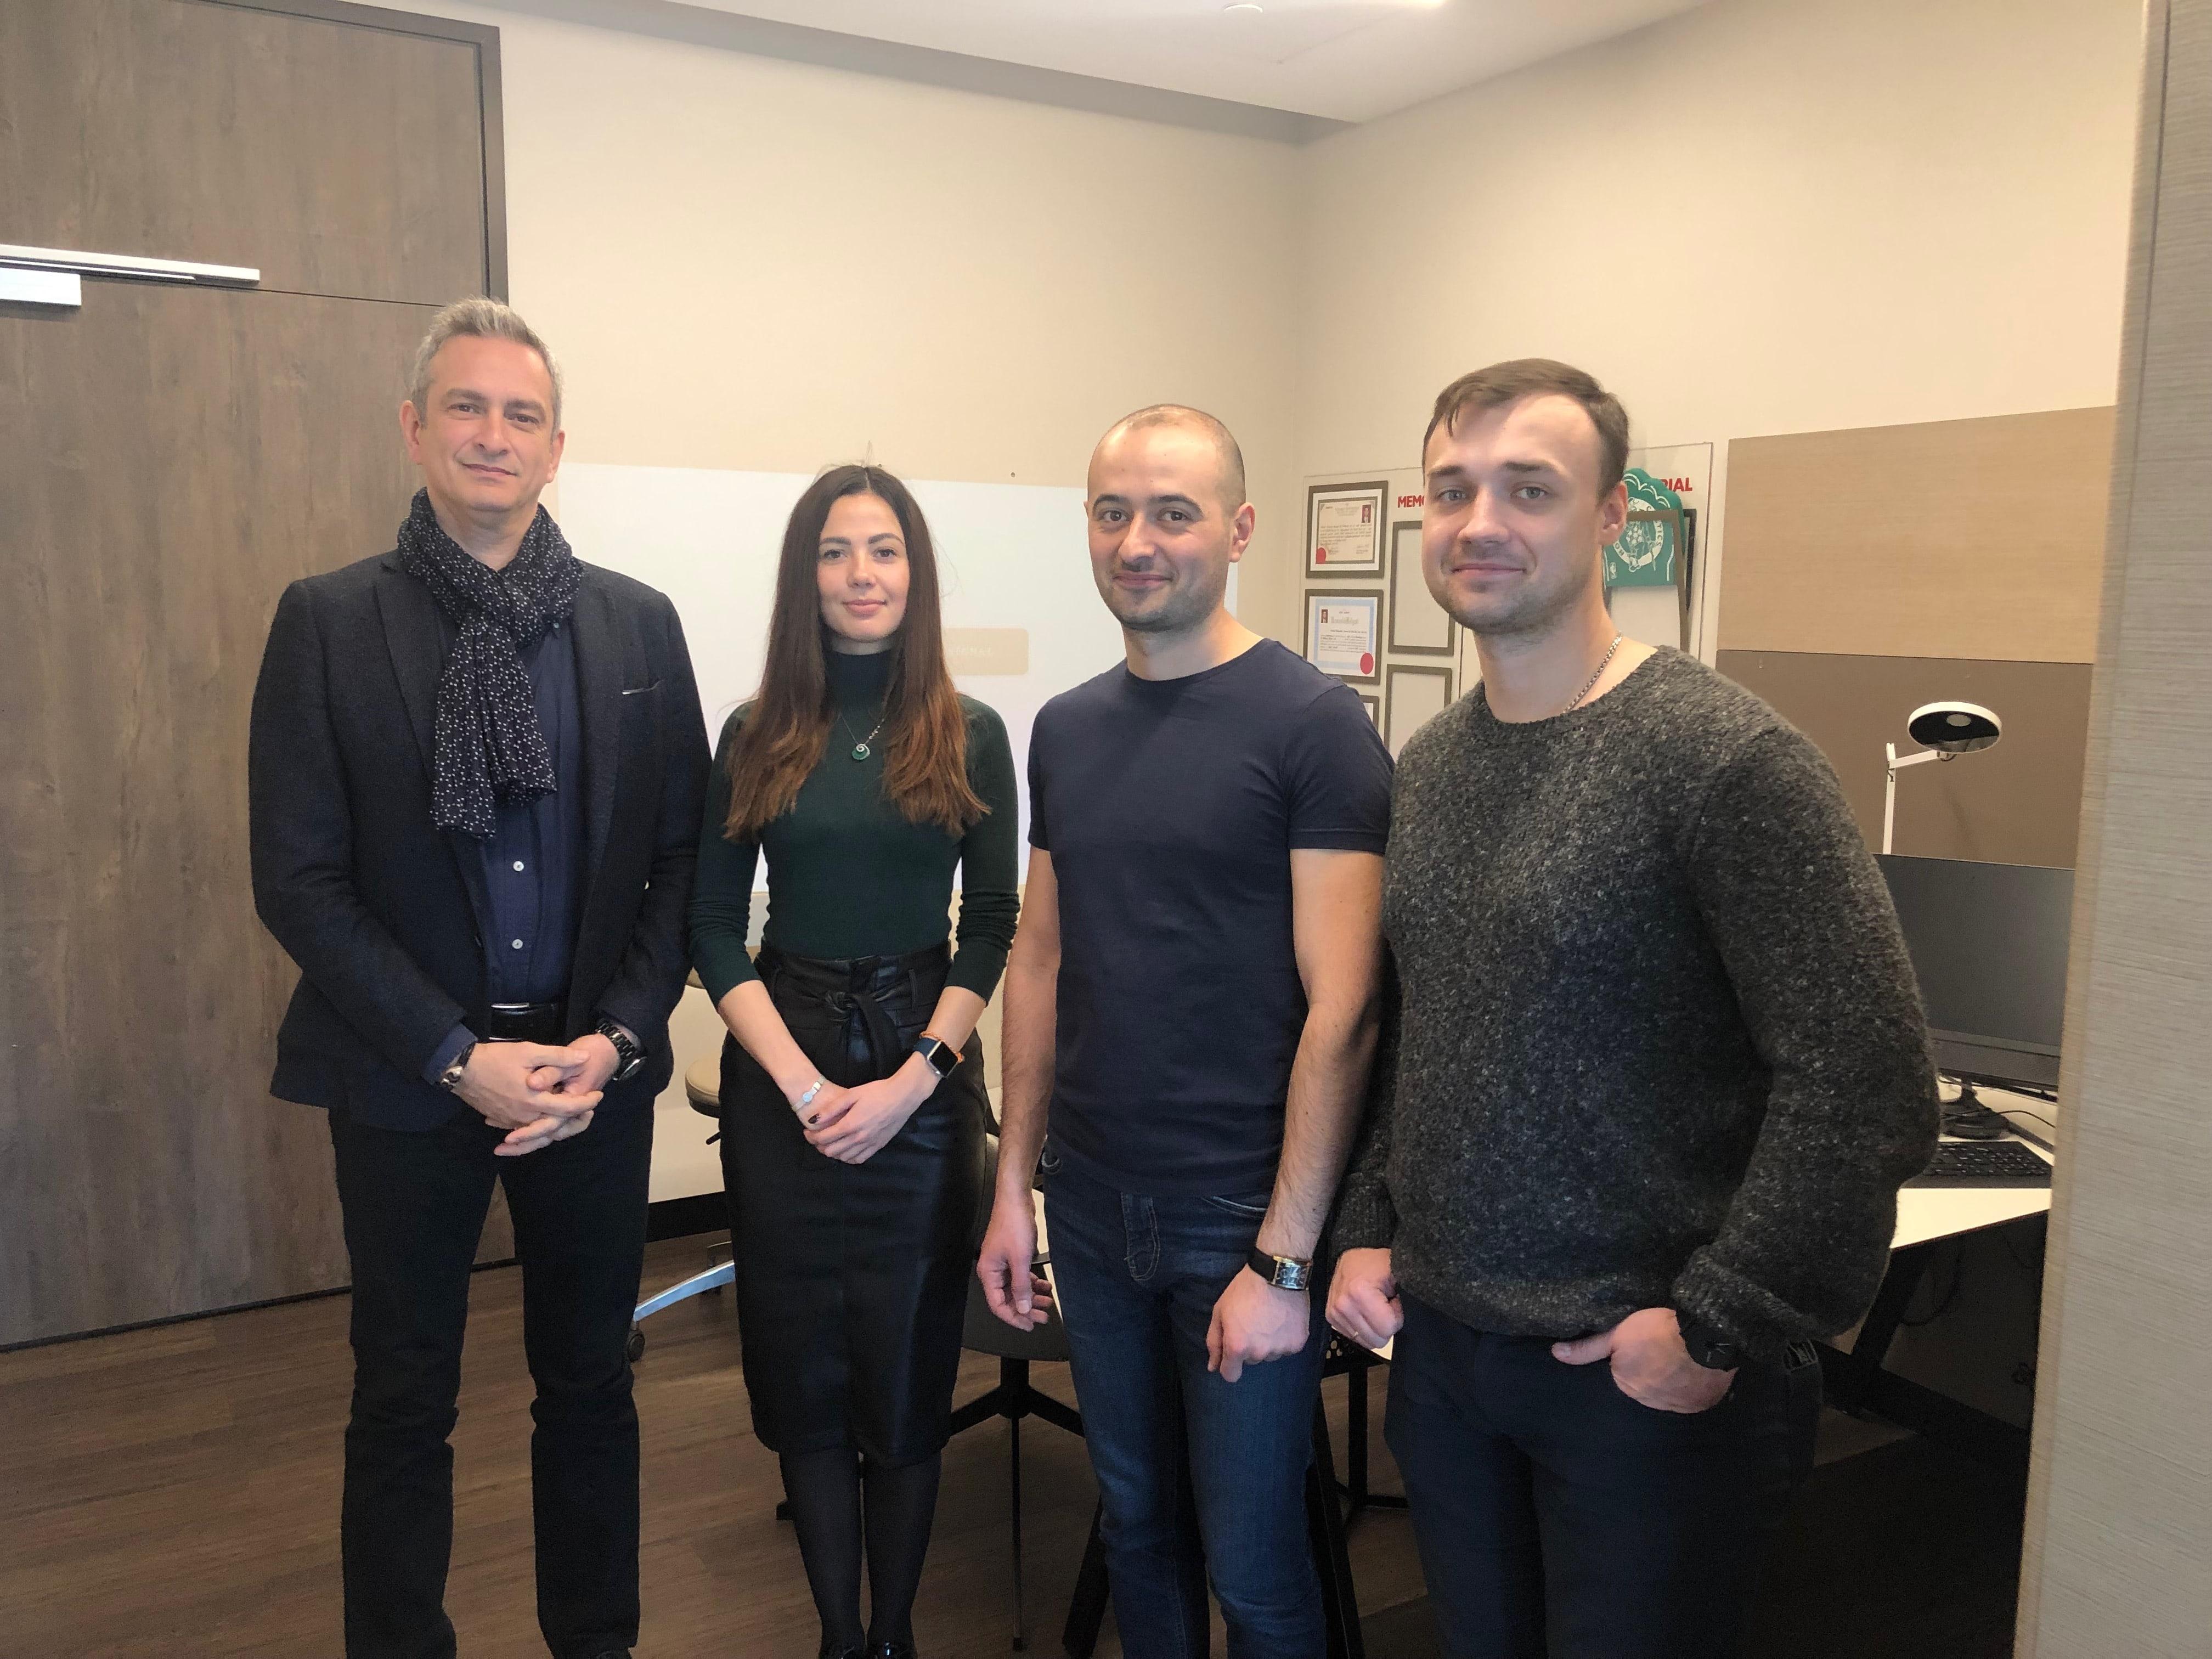 Bookimed team with Murat Çağ